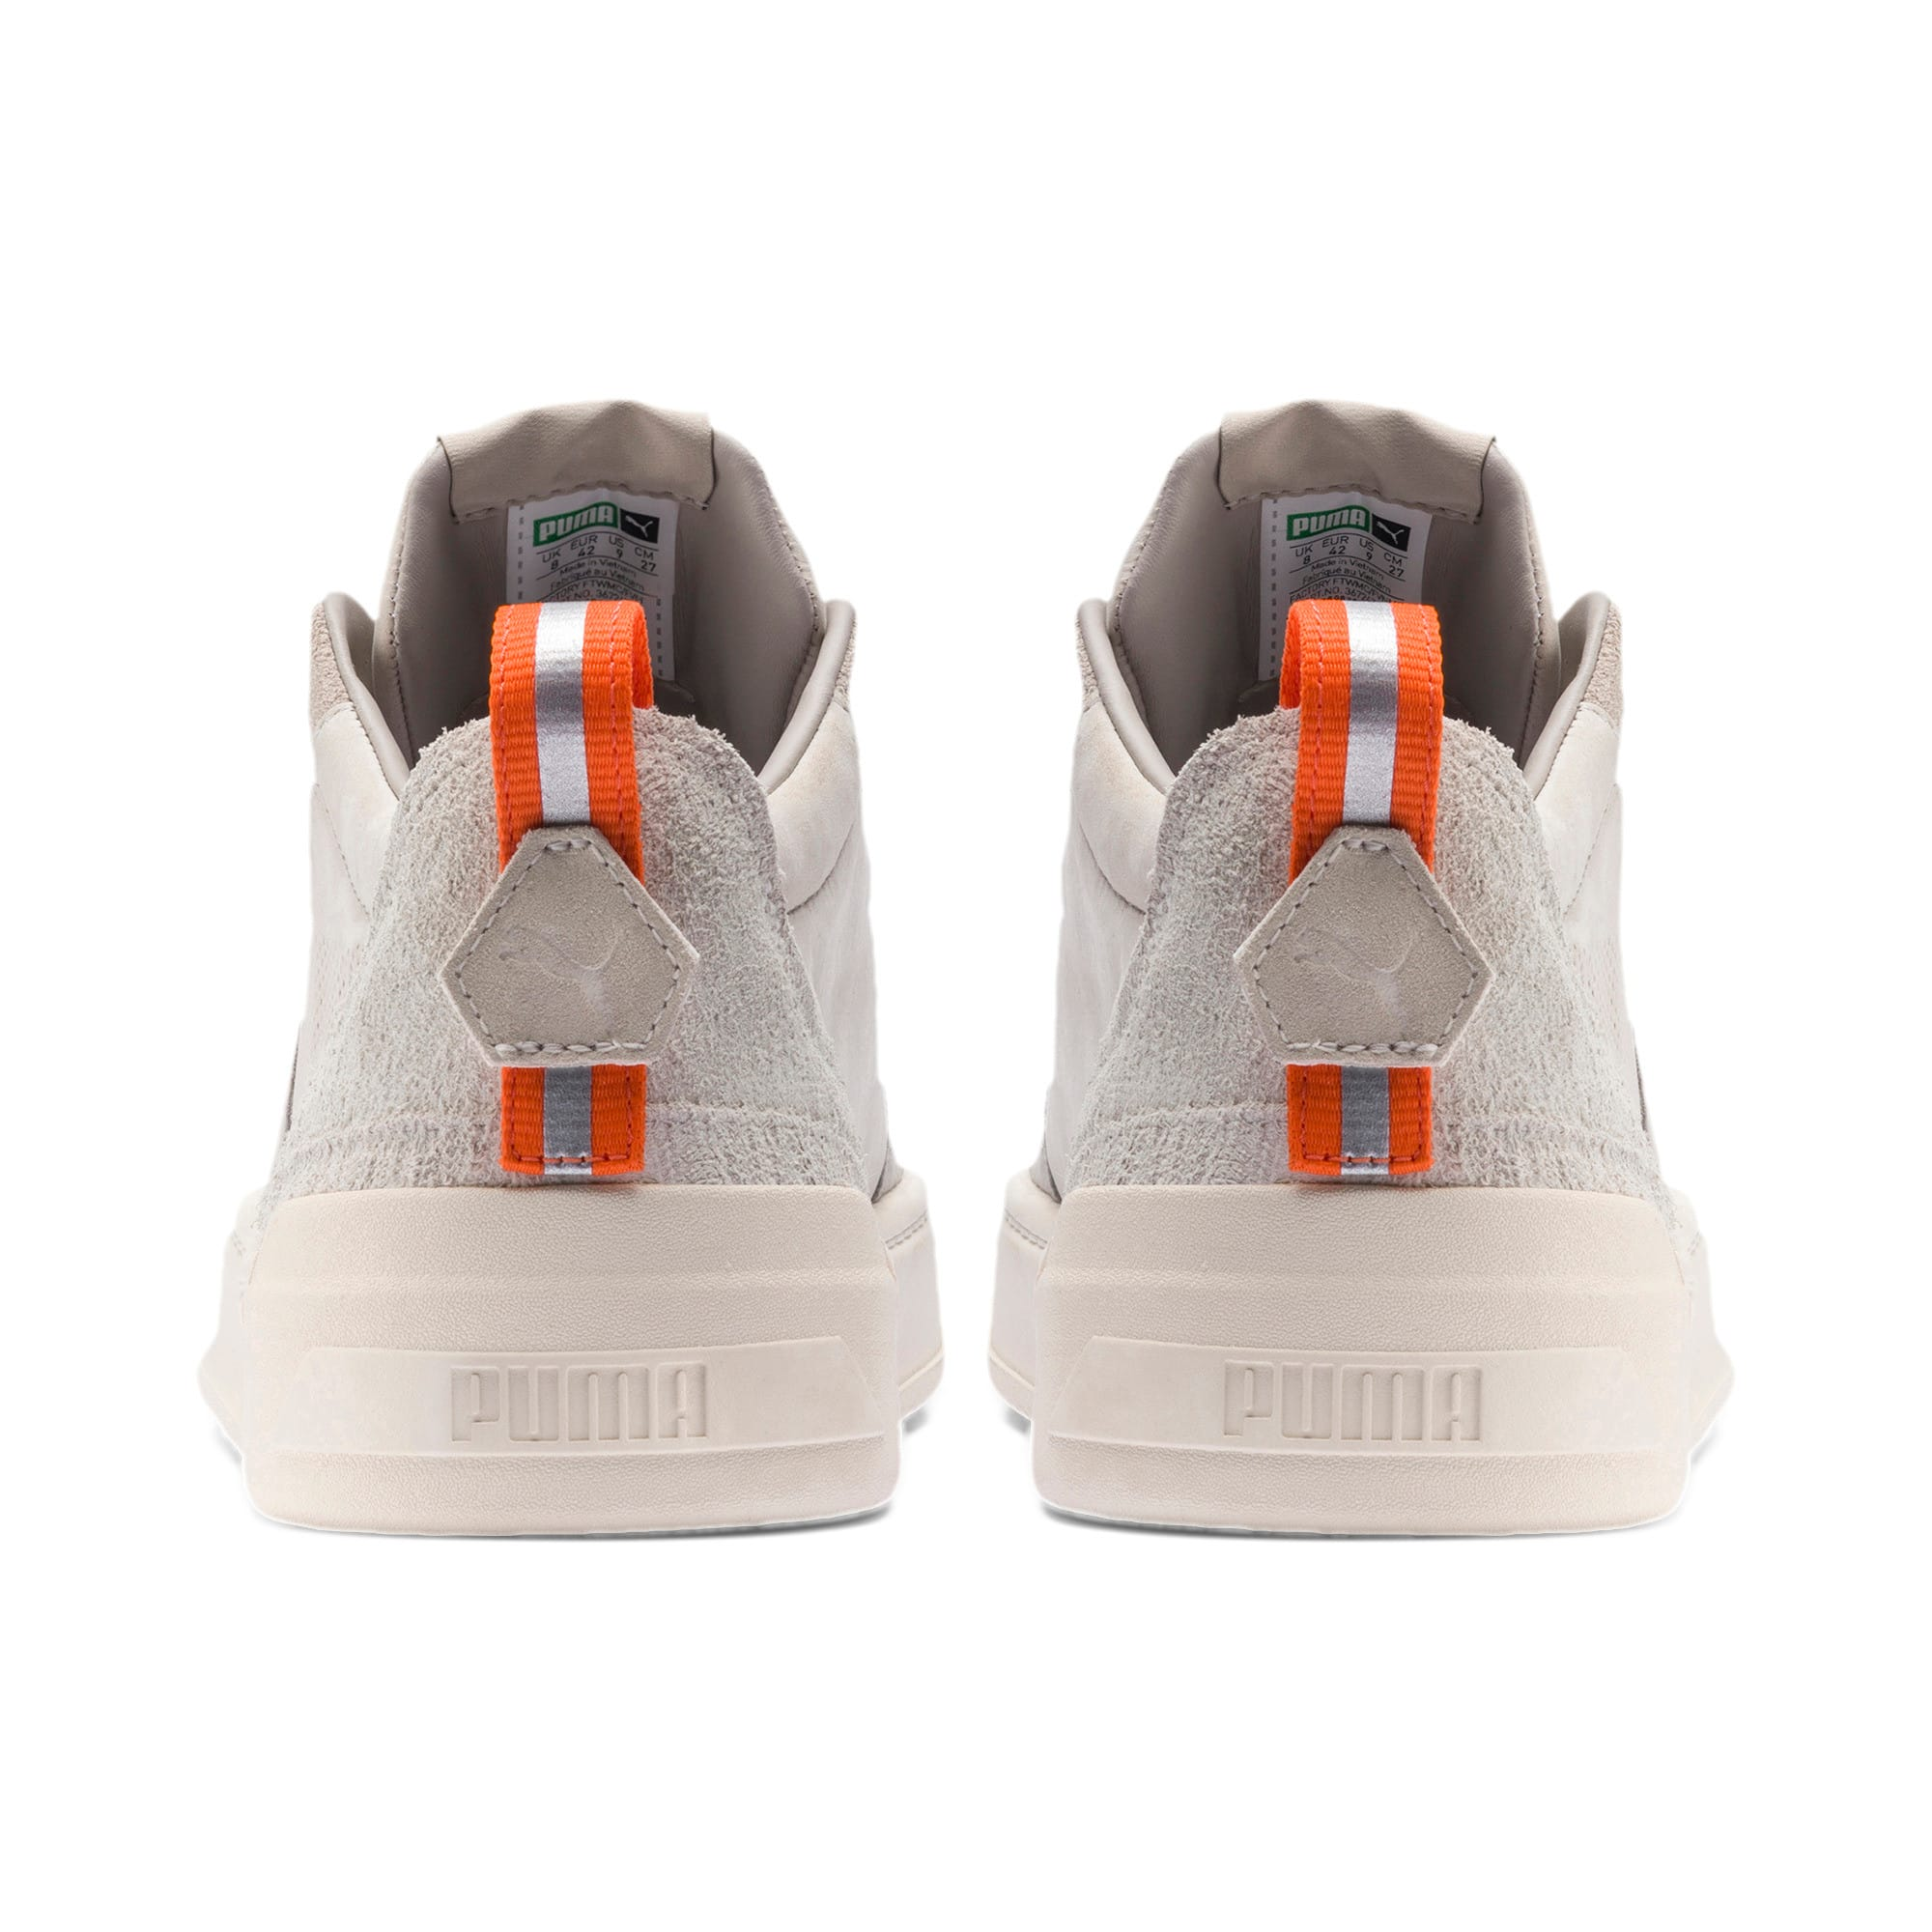 Imagen en miniatura 3 de Zapatillas Cali Zero Demi Beige, Satellite-Silver Gray, mediana